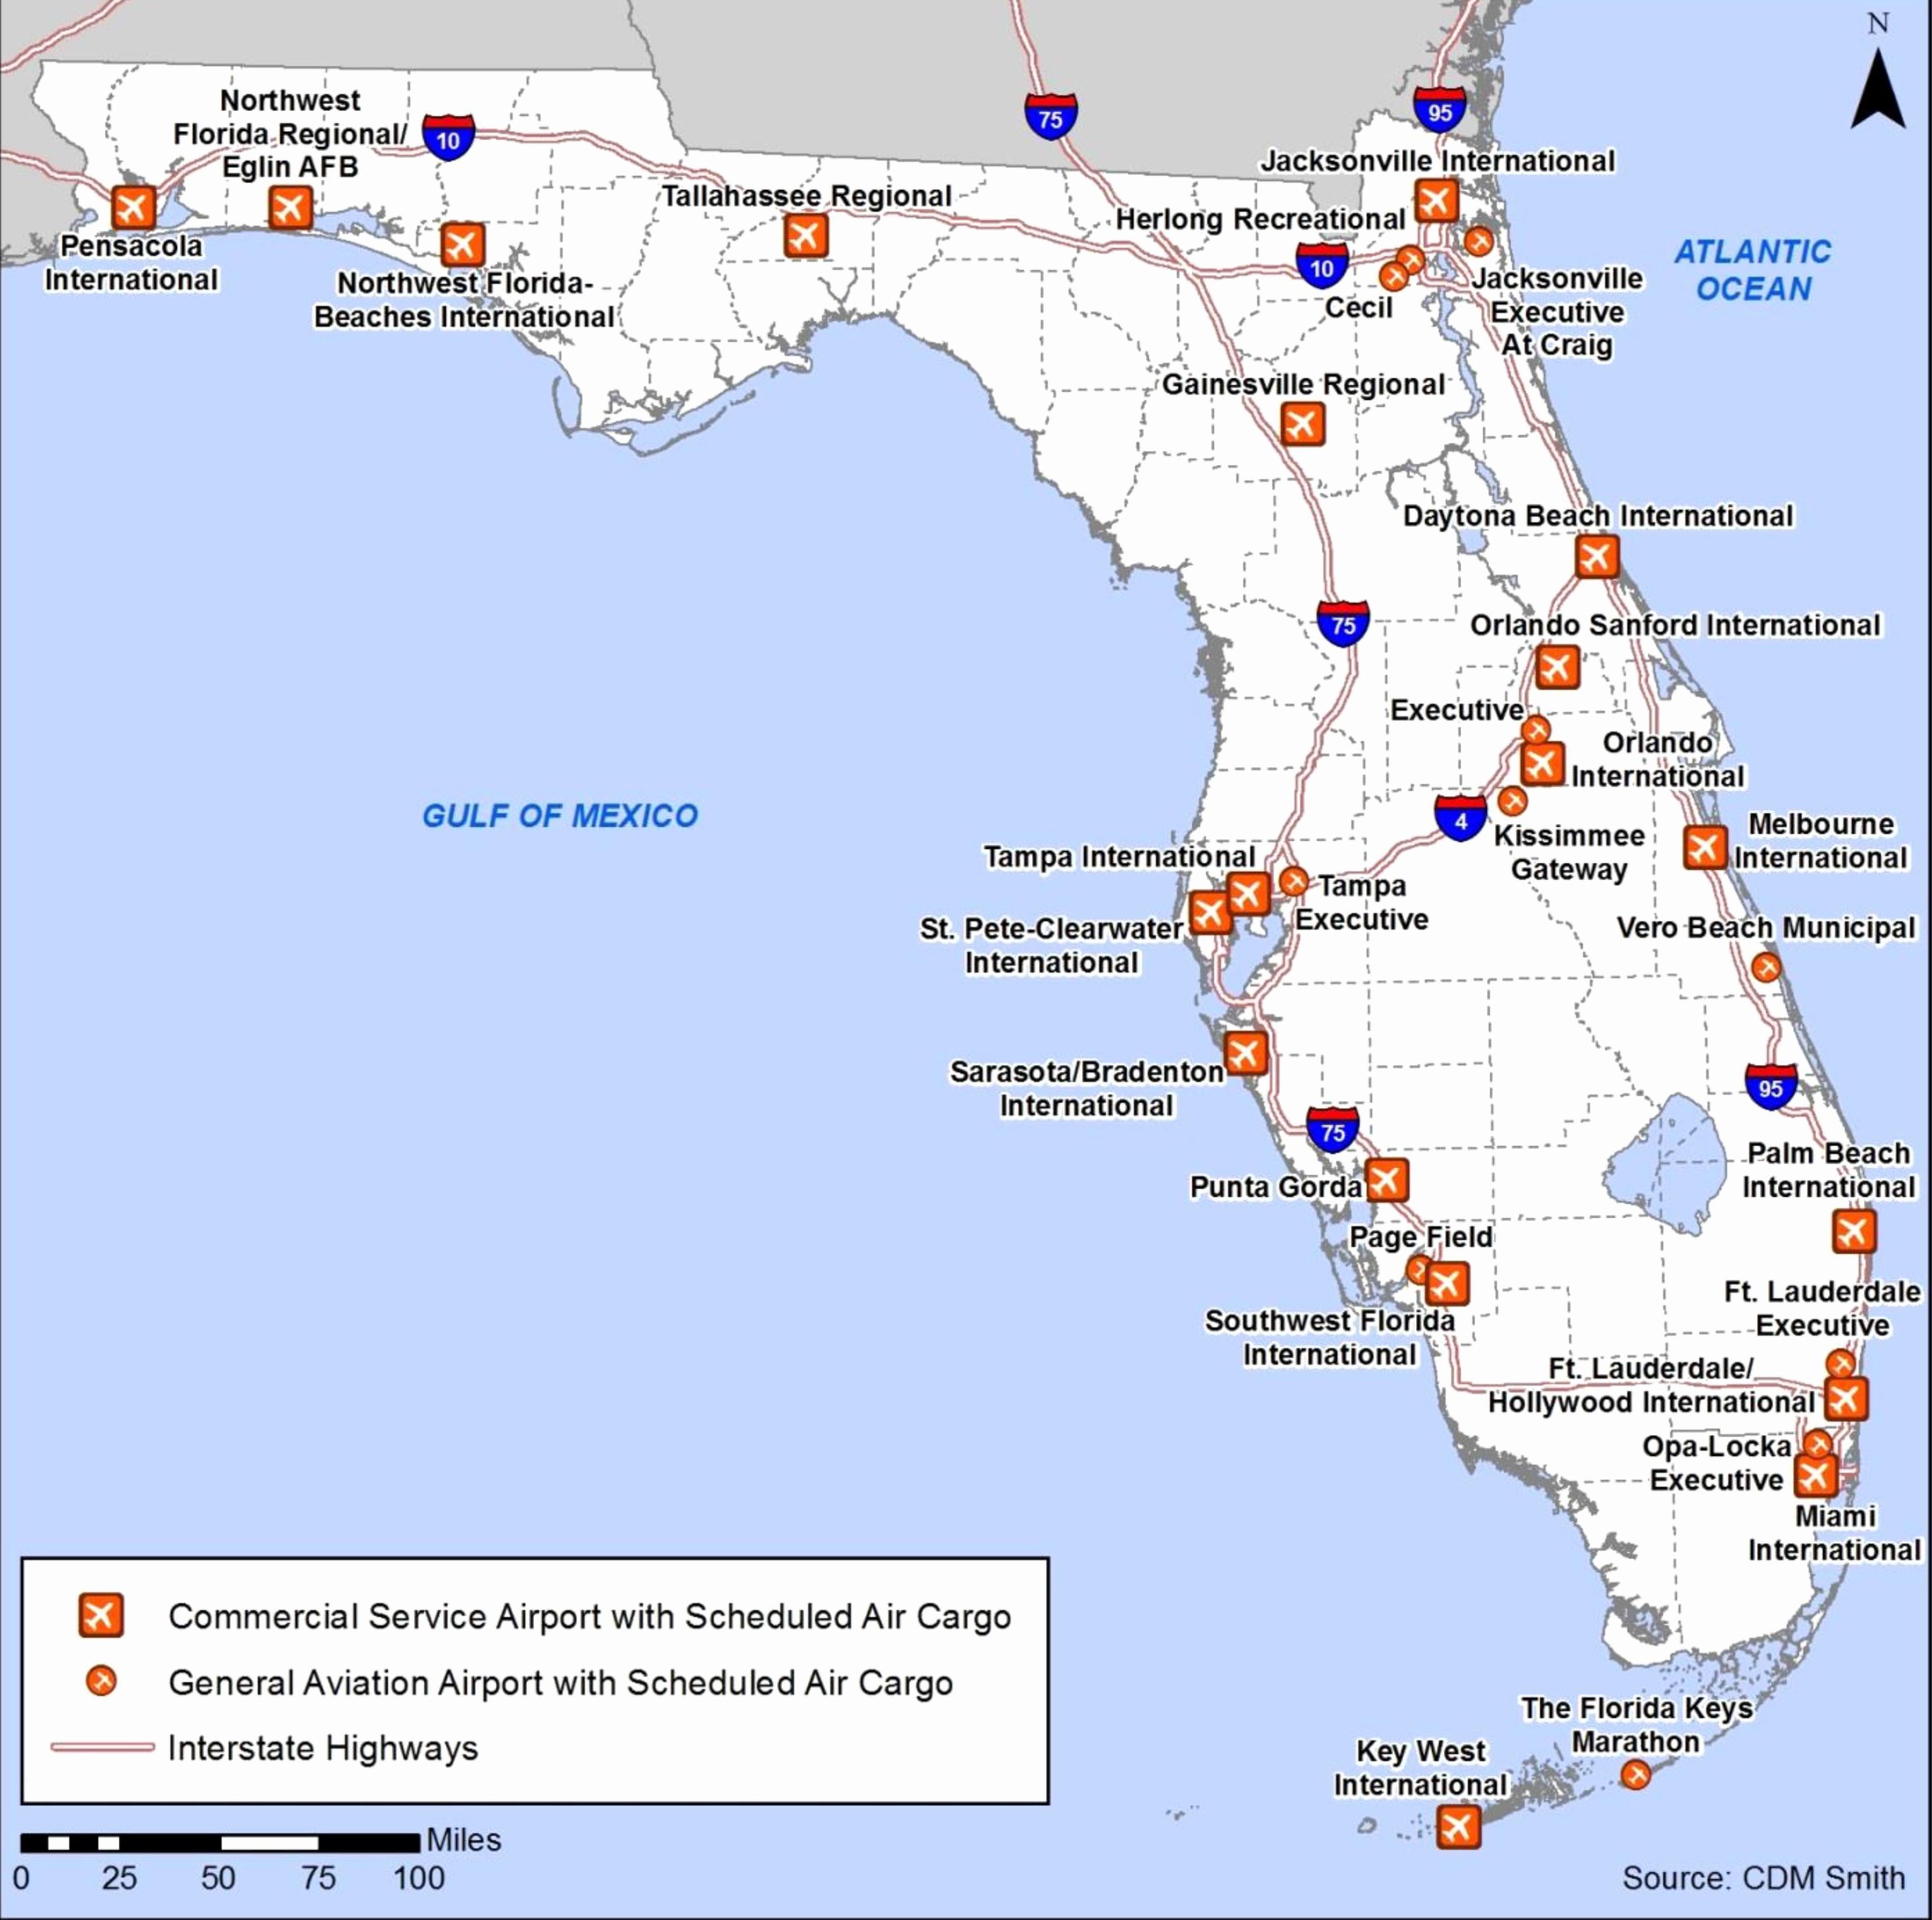 East Coast Beaches Map Inspirational Florida Beach Map Florida River - Map Of Florida West Coast Beaches